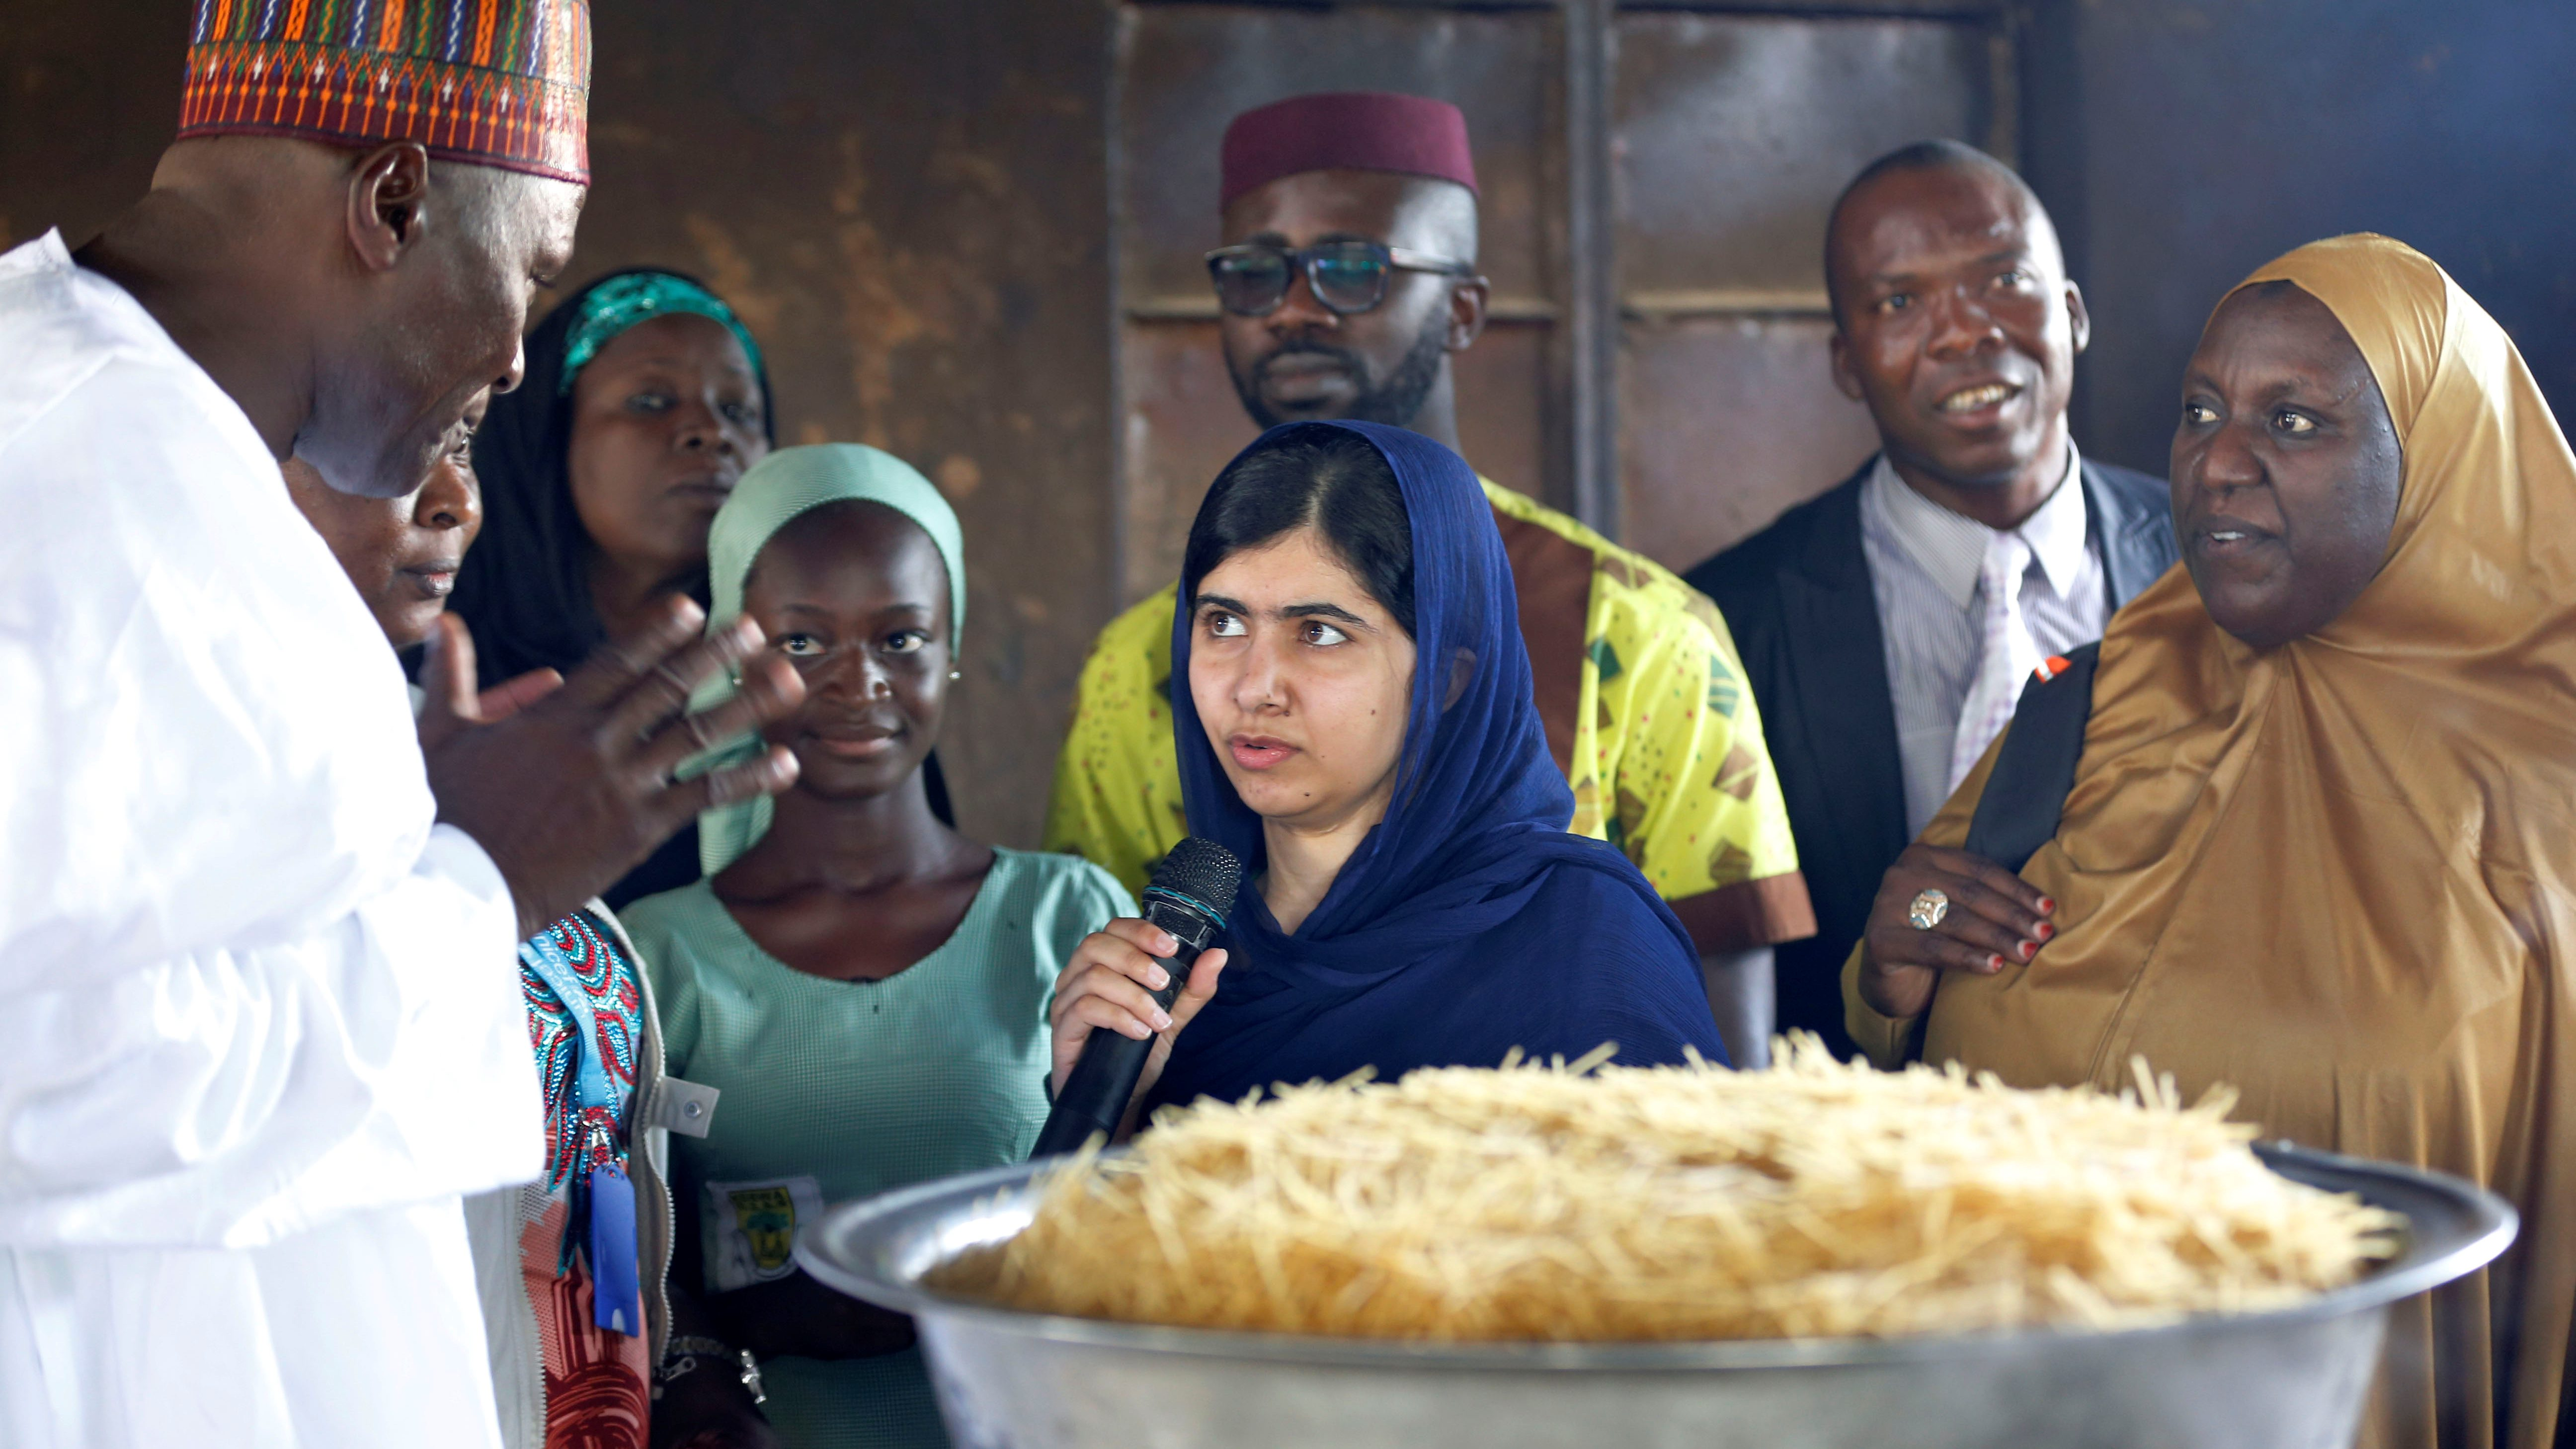 Nobel laureate Malala Yousafzai seen at the kitchen of Yerwa Girls school in Maiduguri, Nigeria July 18, 2017.  - RC15B8B75310